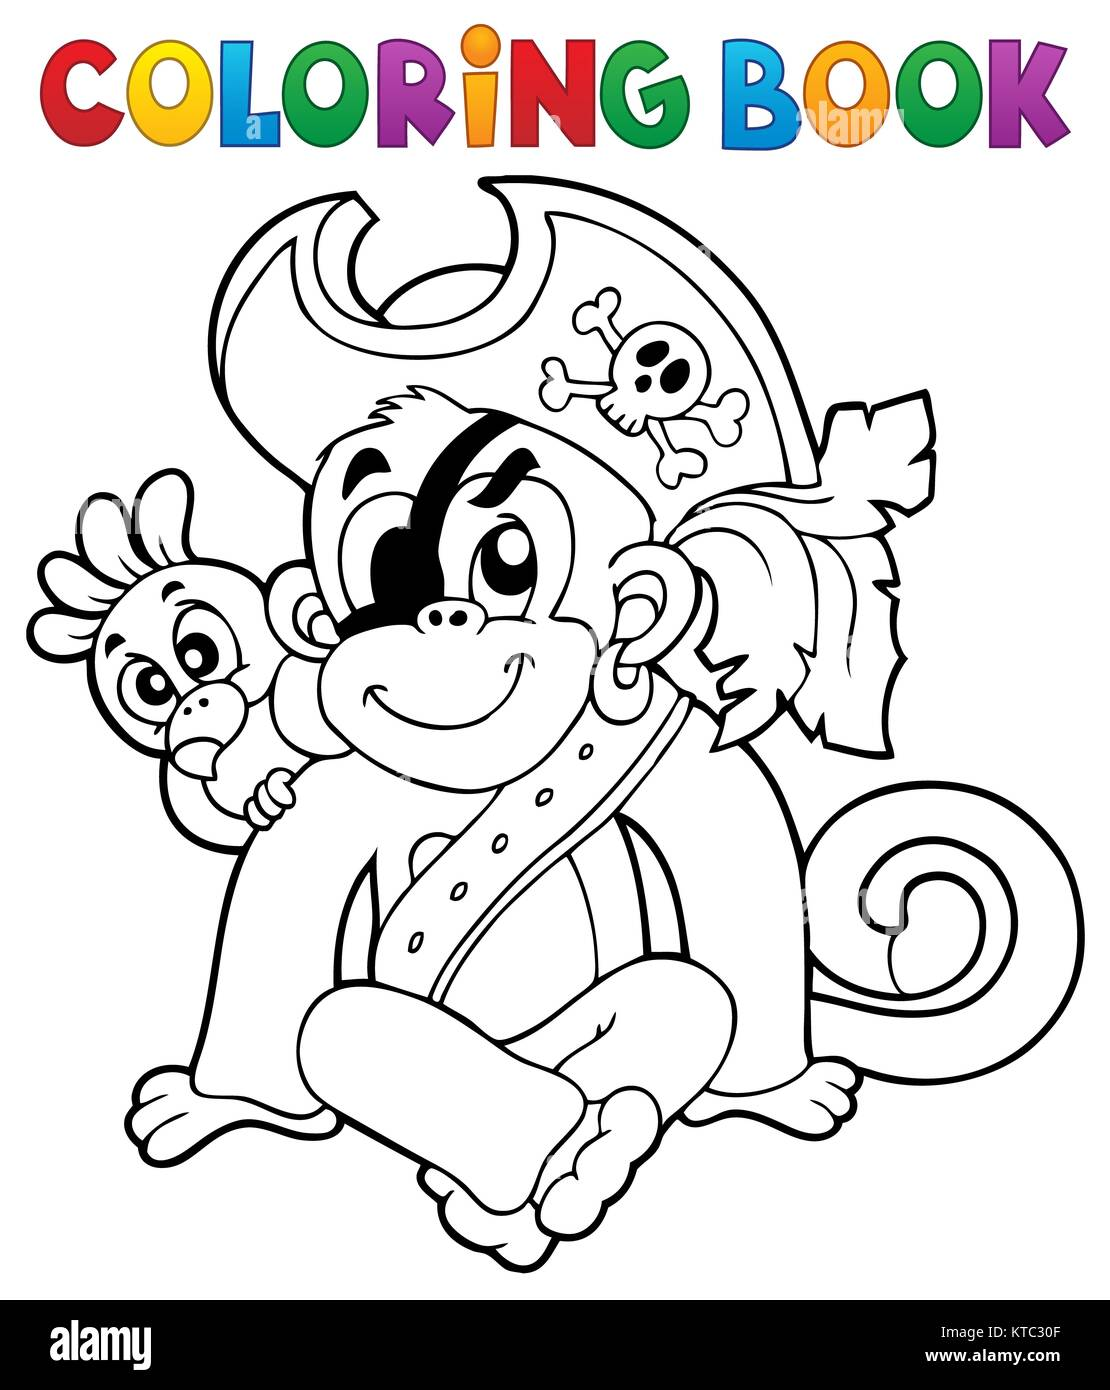 Livre de coloriage singe pirate image 32 Photo Stock   Alamy